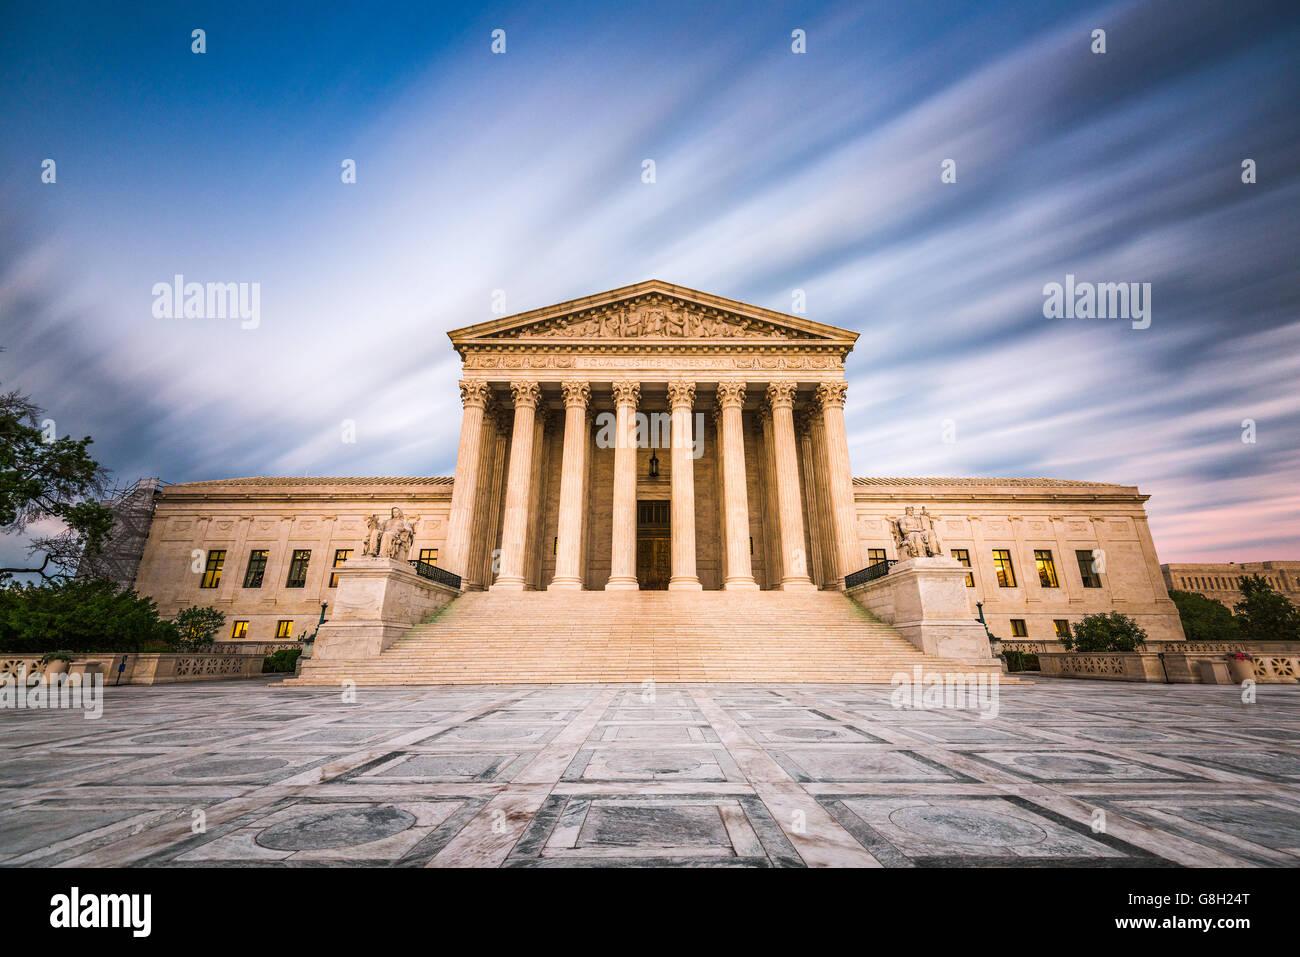 United States Supreme Court Gebäude in Washington DC, USA. Stockbild